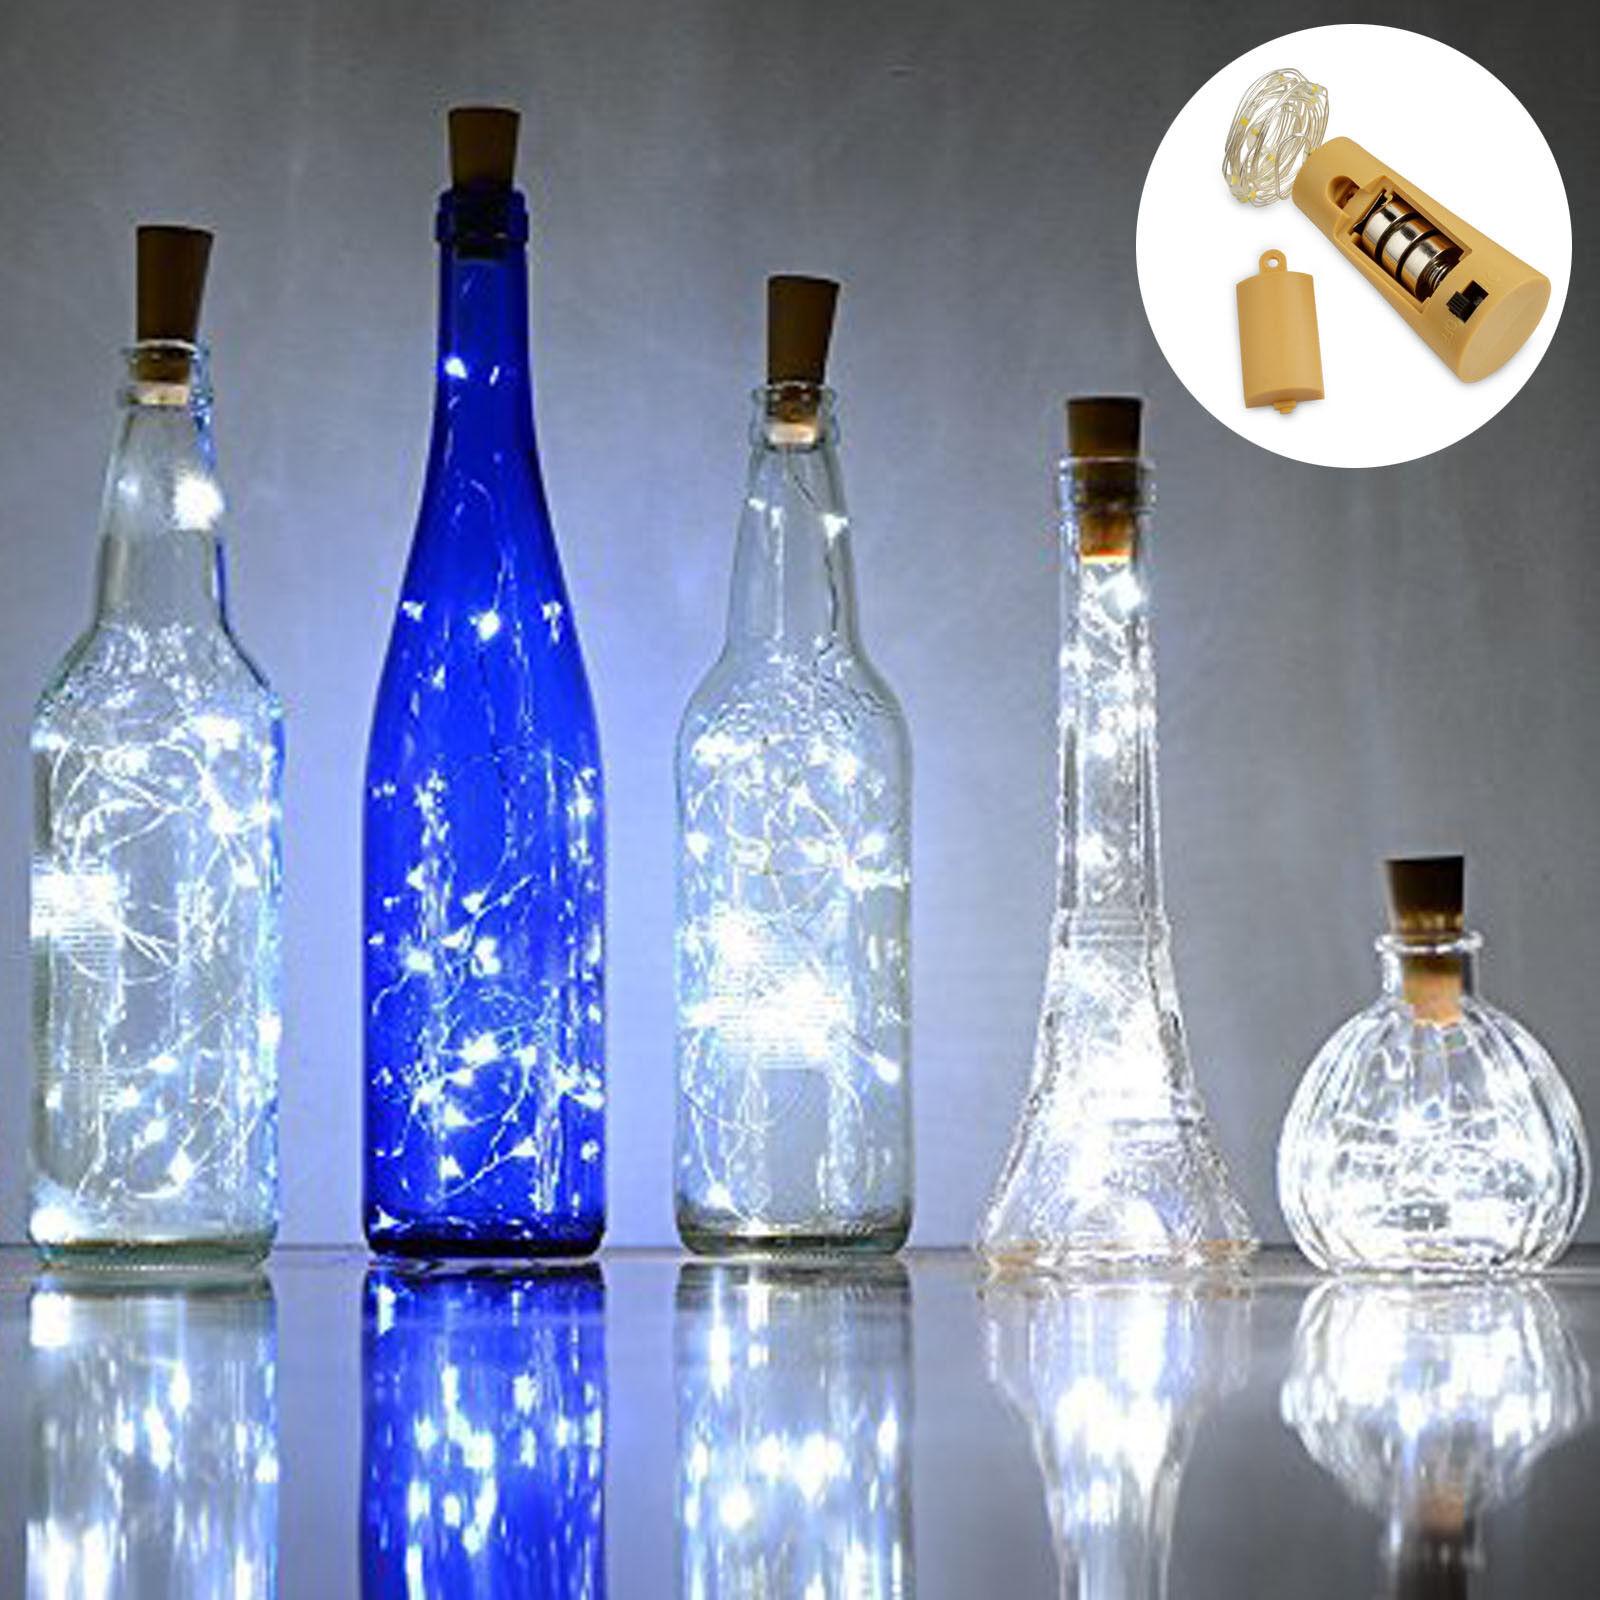 Wine Bottle Cork Led Lights Battery Operated Fairy Mini String Diy Decor For Sale Online Ebay